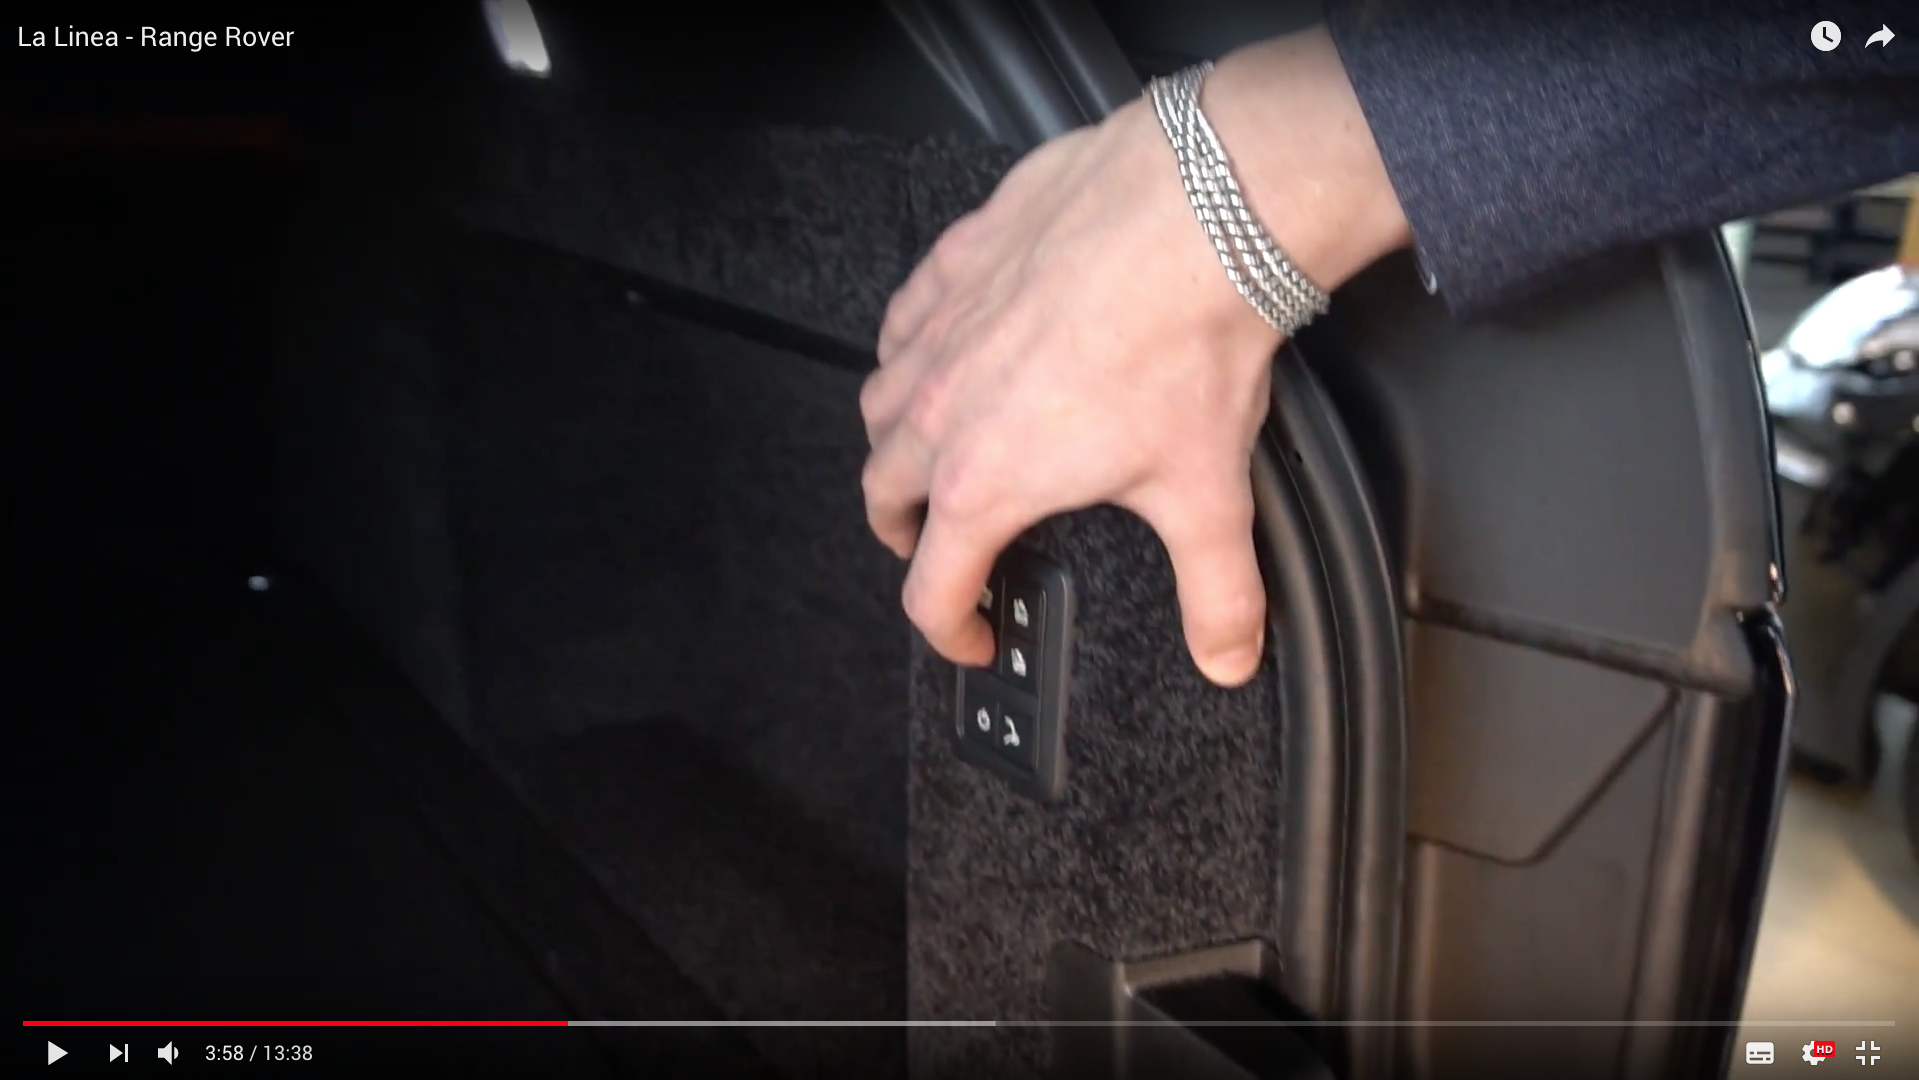 2017 La Linea - Range Rover auto verstellbare Rückbank_MSM_MEDIEN_SAAR_MOSEL_SAARLAND_FERNSEHEN_1_ED_SAAR